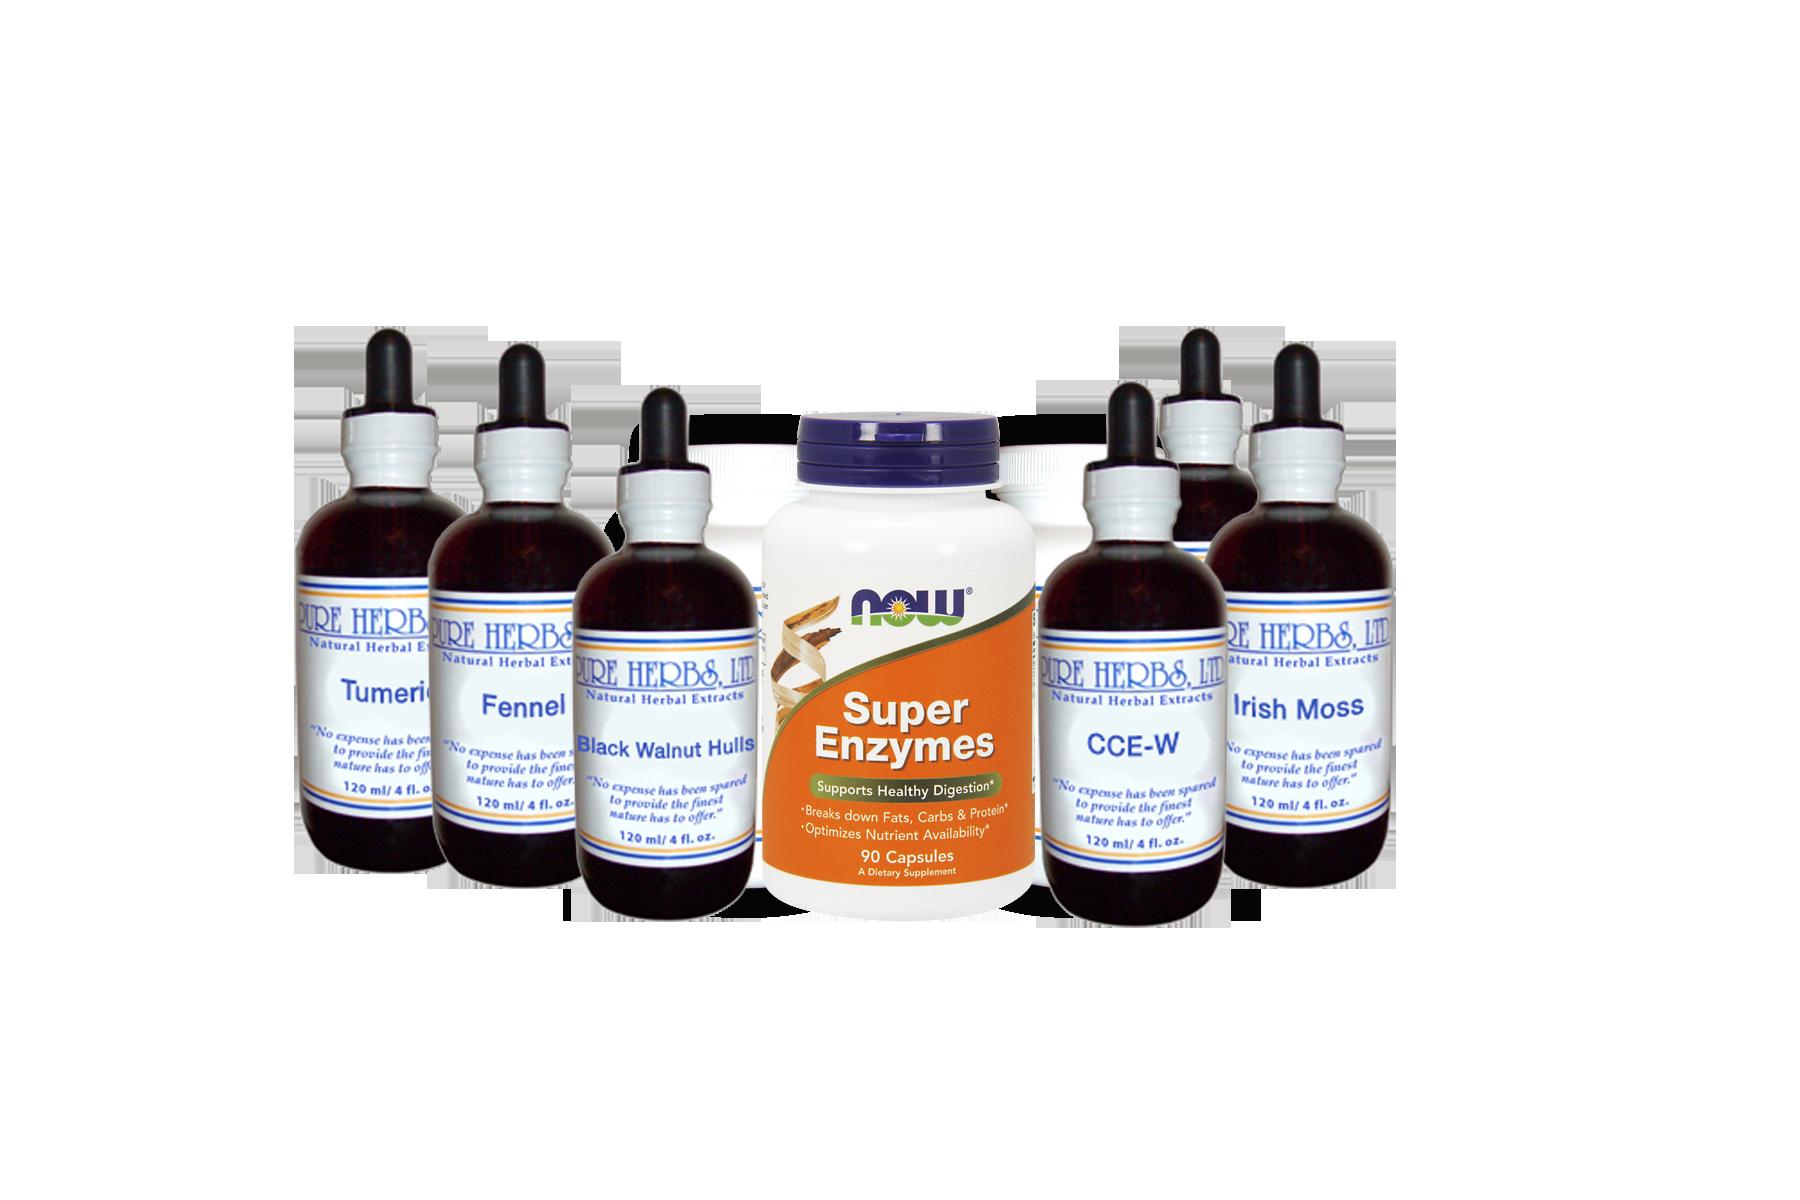 Bowel Cleanse, Liquids